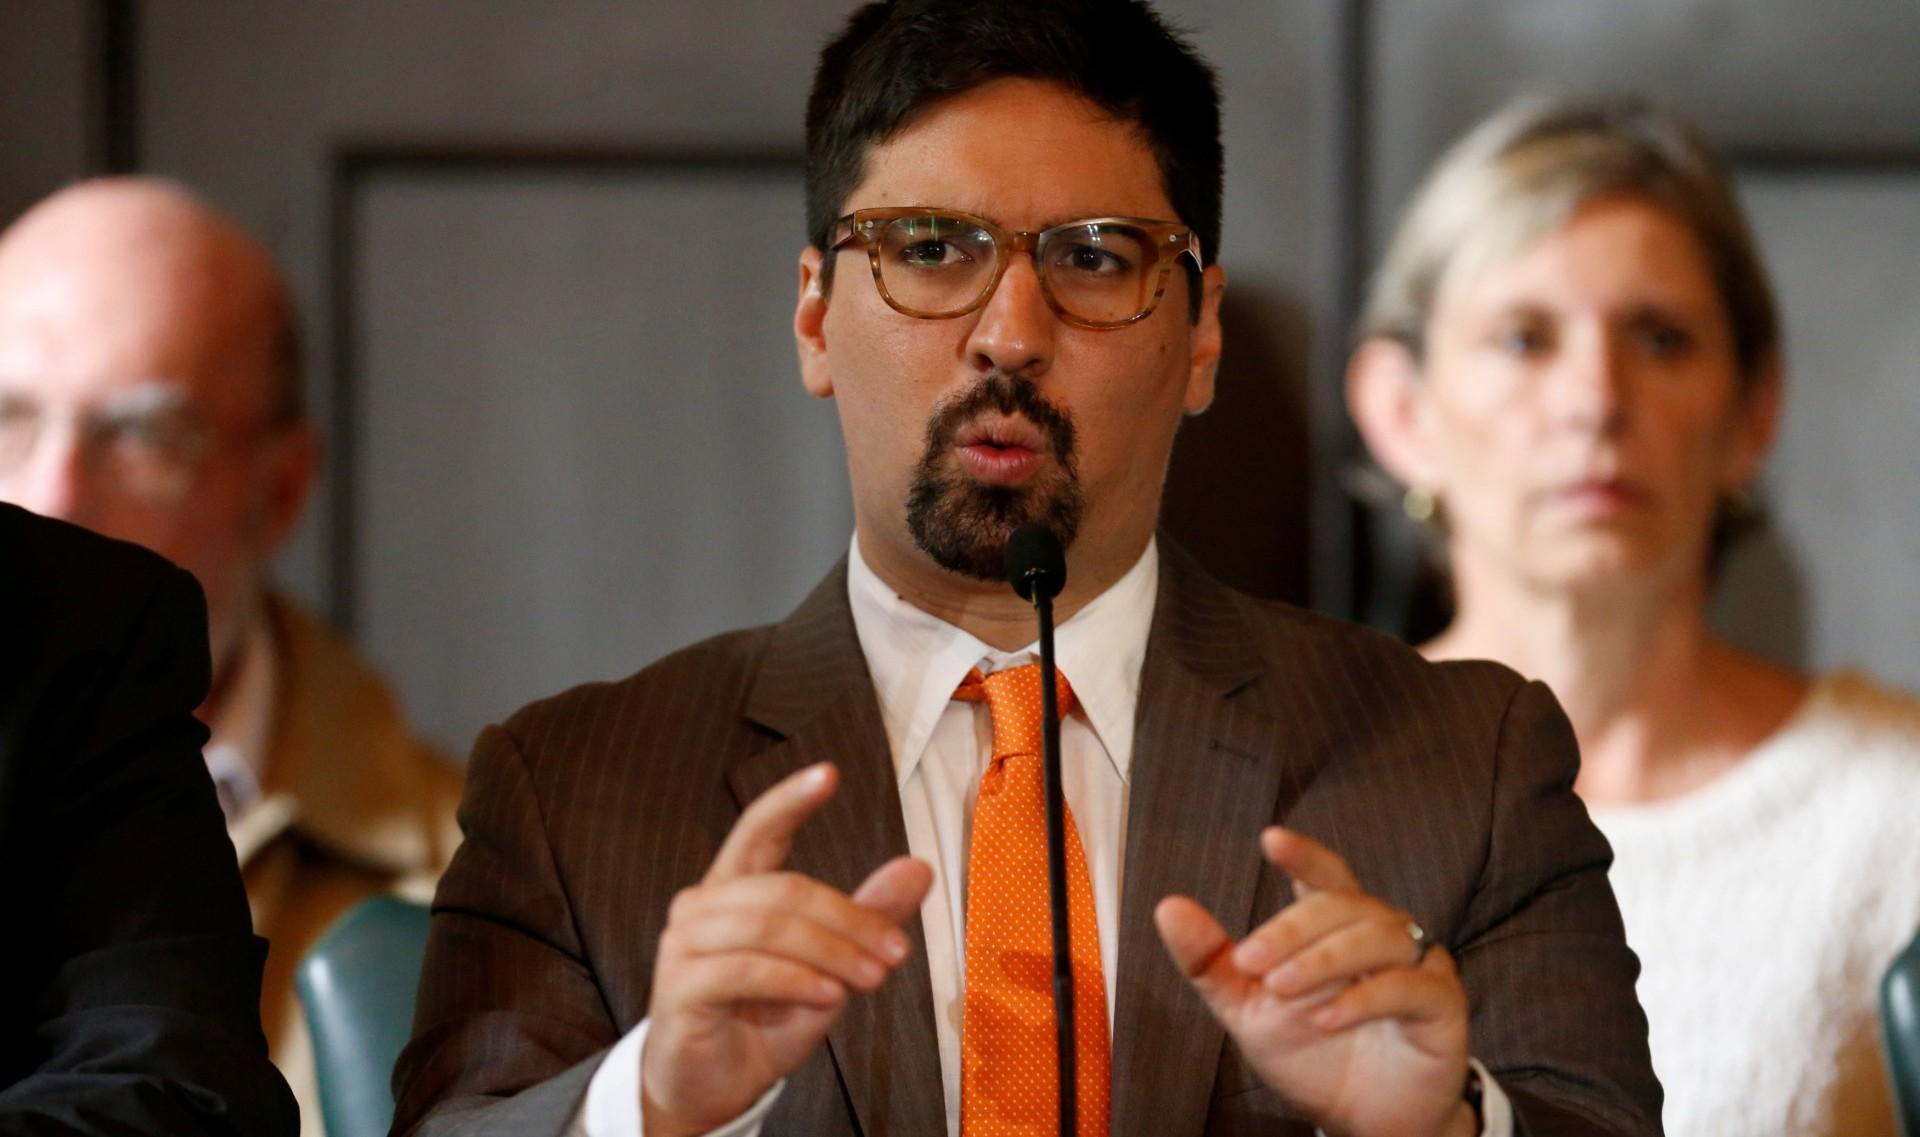 El primer vicepresidente de la Asamblea Nacional venezolana Freddy Guevara (REUTERS/Andres Martinez)